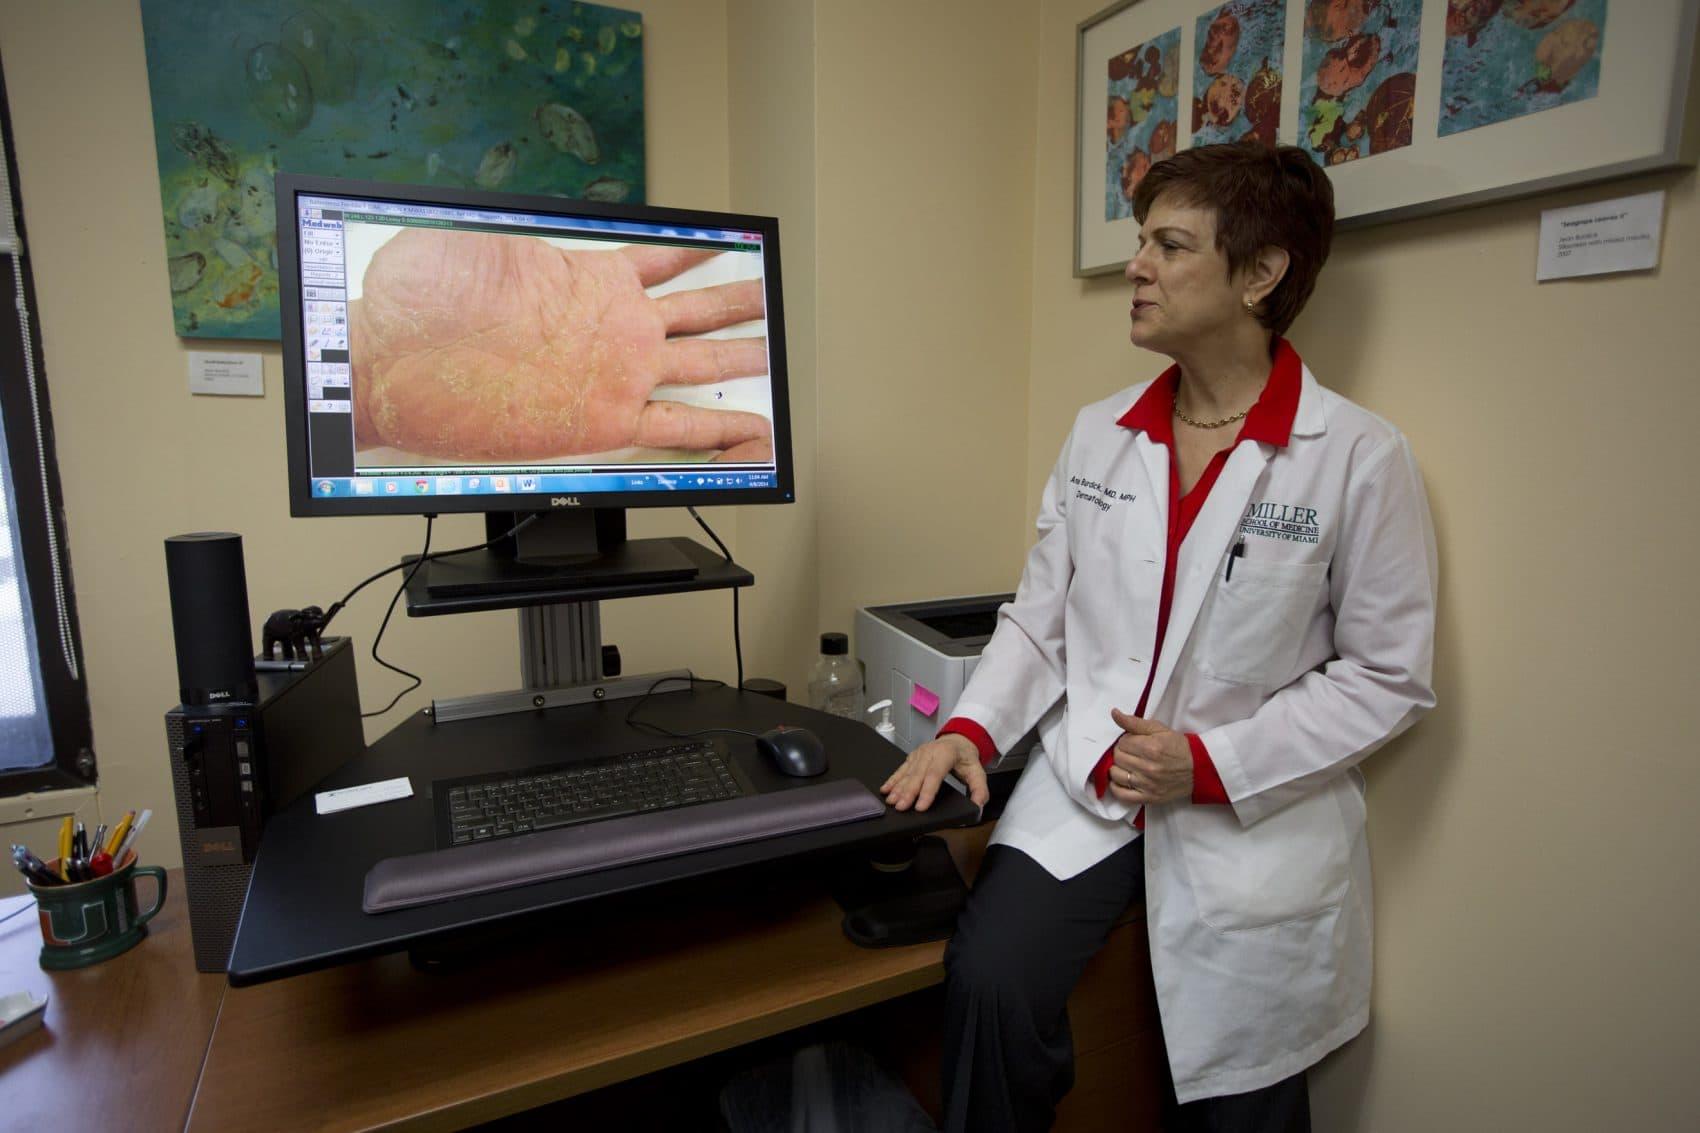 University of Miami dermatologist Dr. Anne Burdick checks the computer screen as she discusses telemedicine on April 8, 2014. (J Pat Carter/AP)